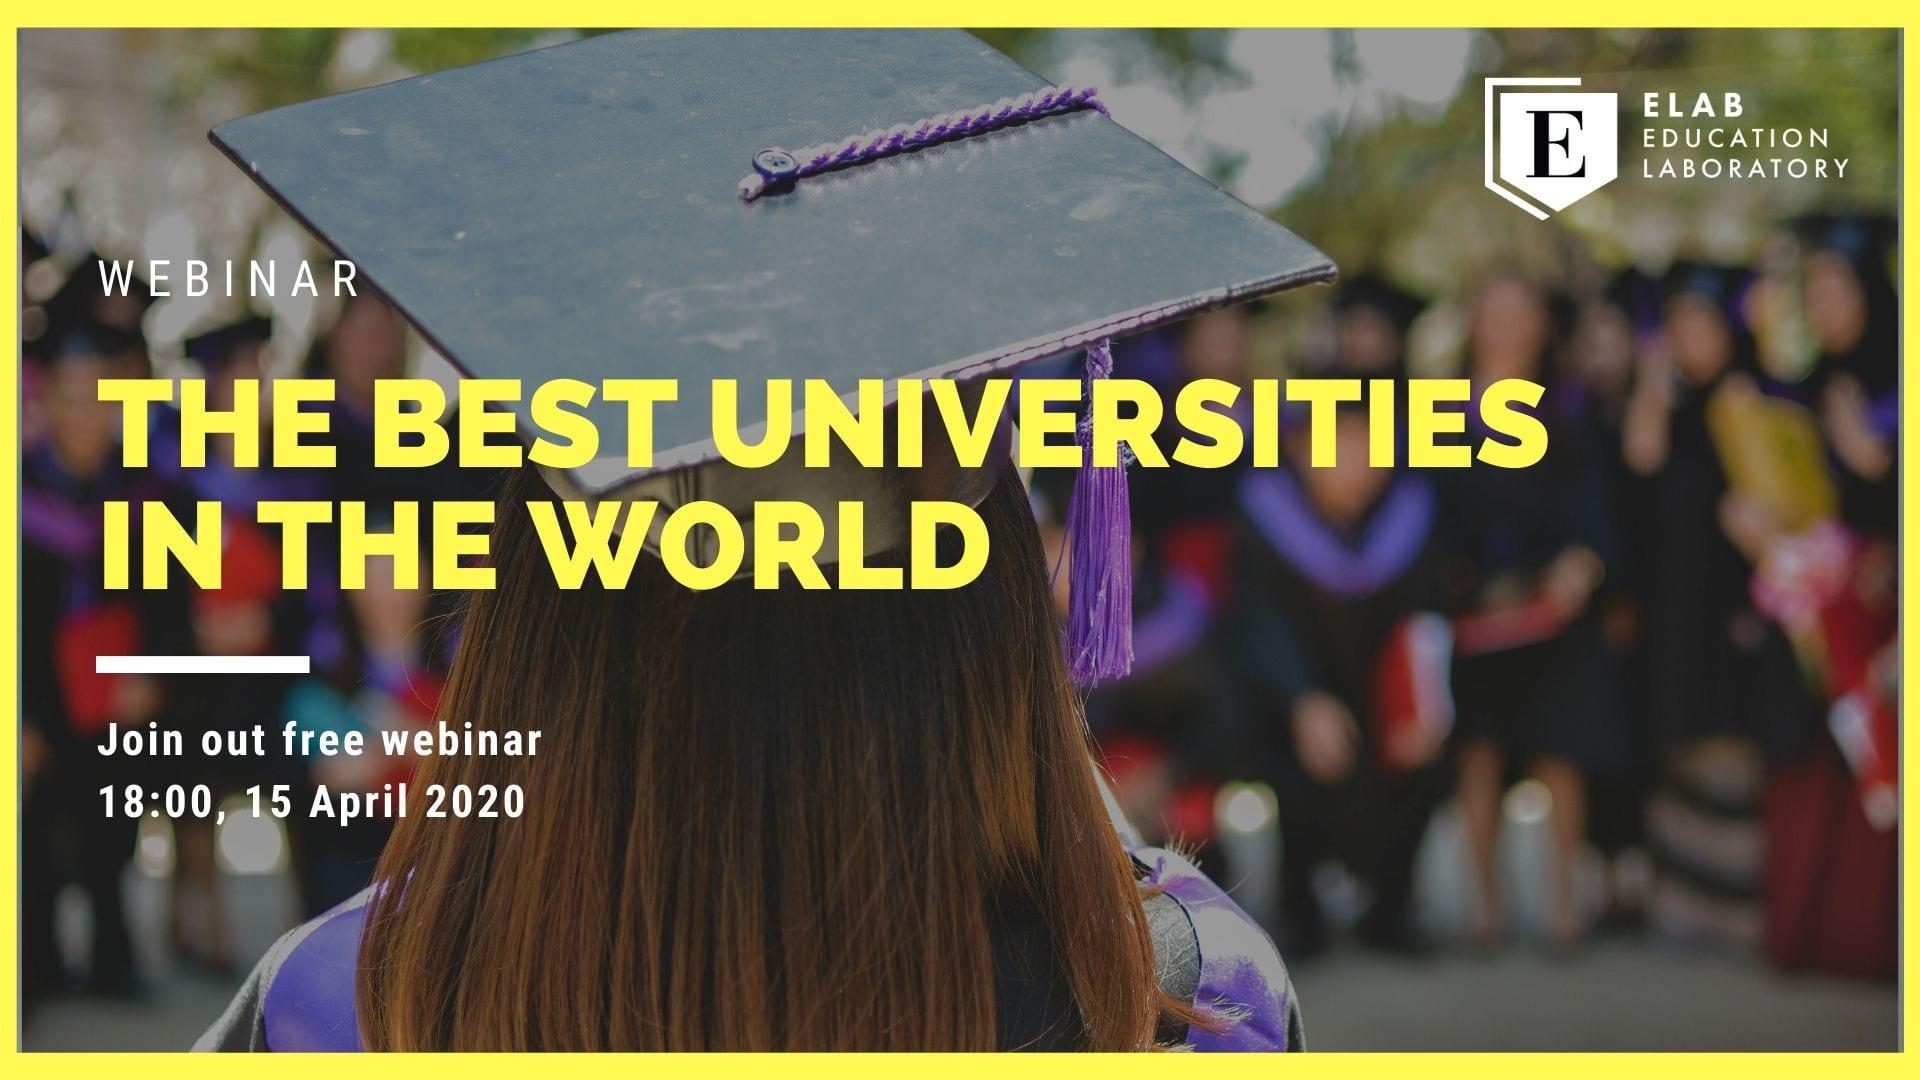 Webinar: The best universities in the world